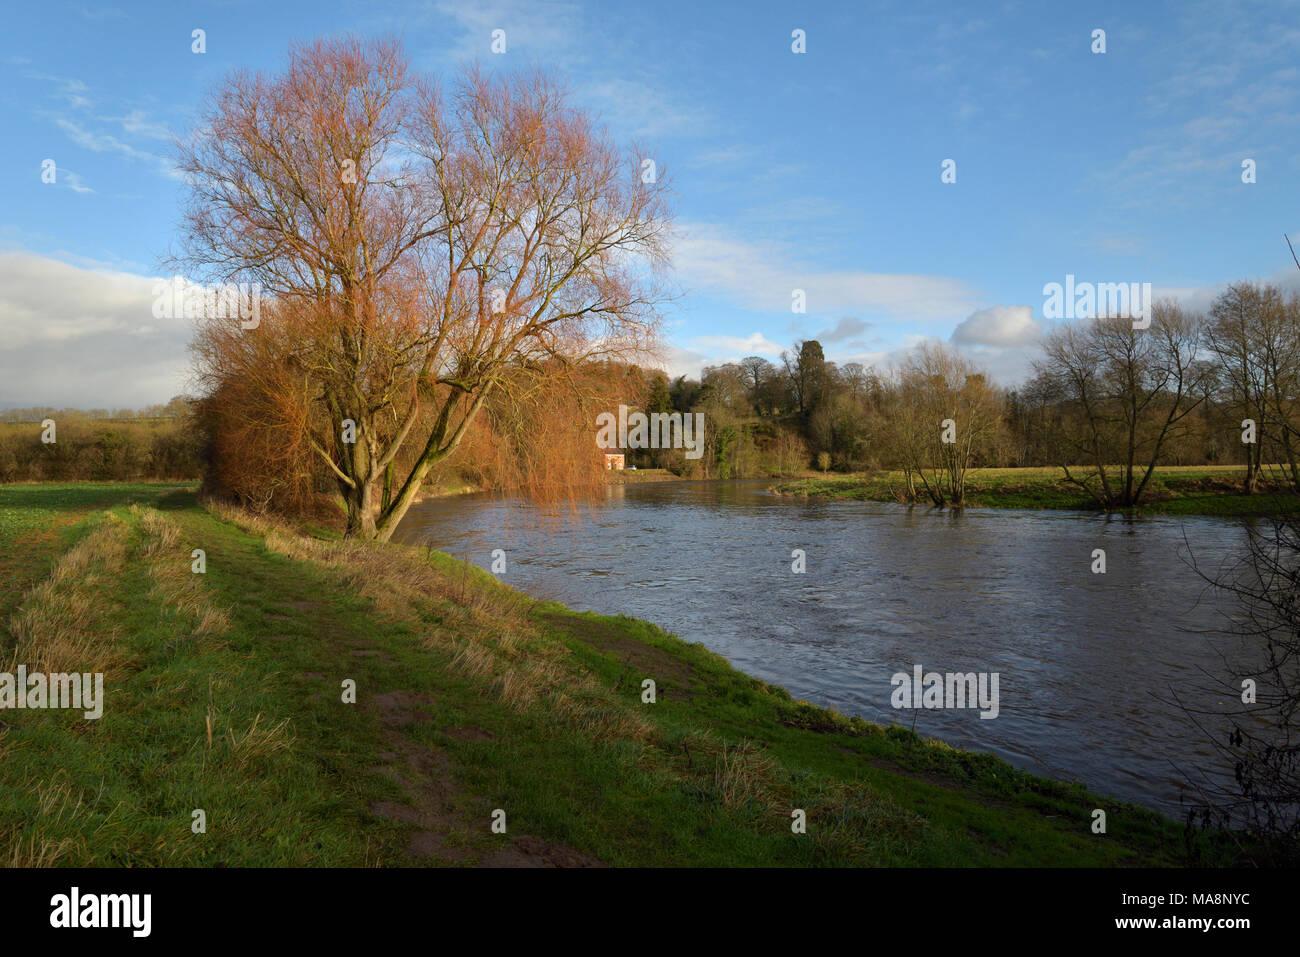 The River Wye in sun near The Warren, Hay on Wye - Stock Image